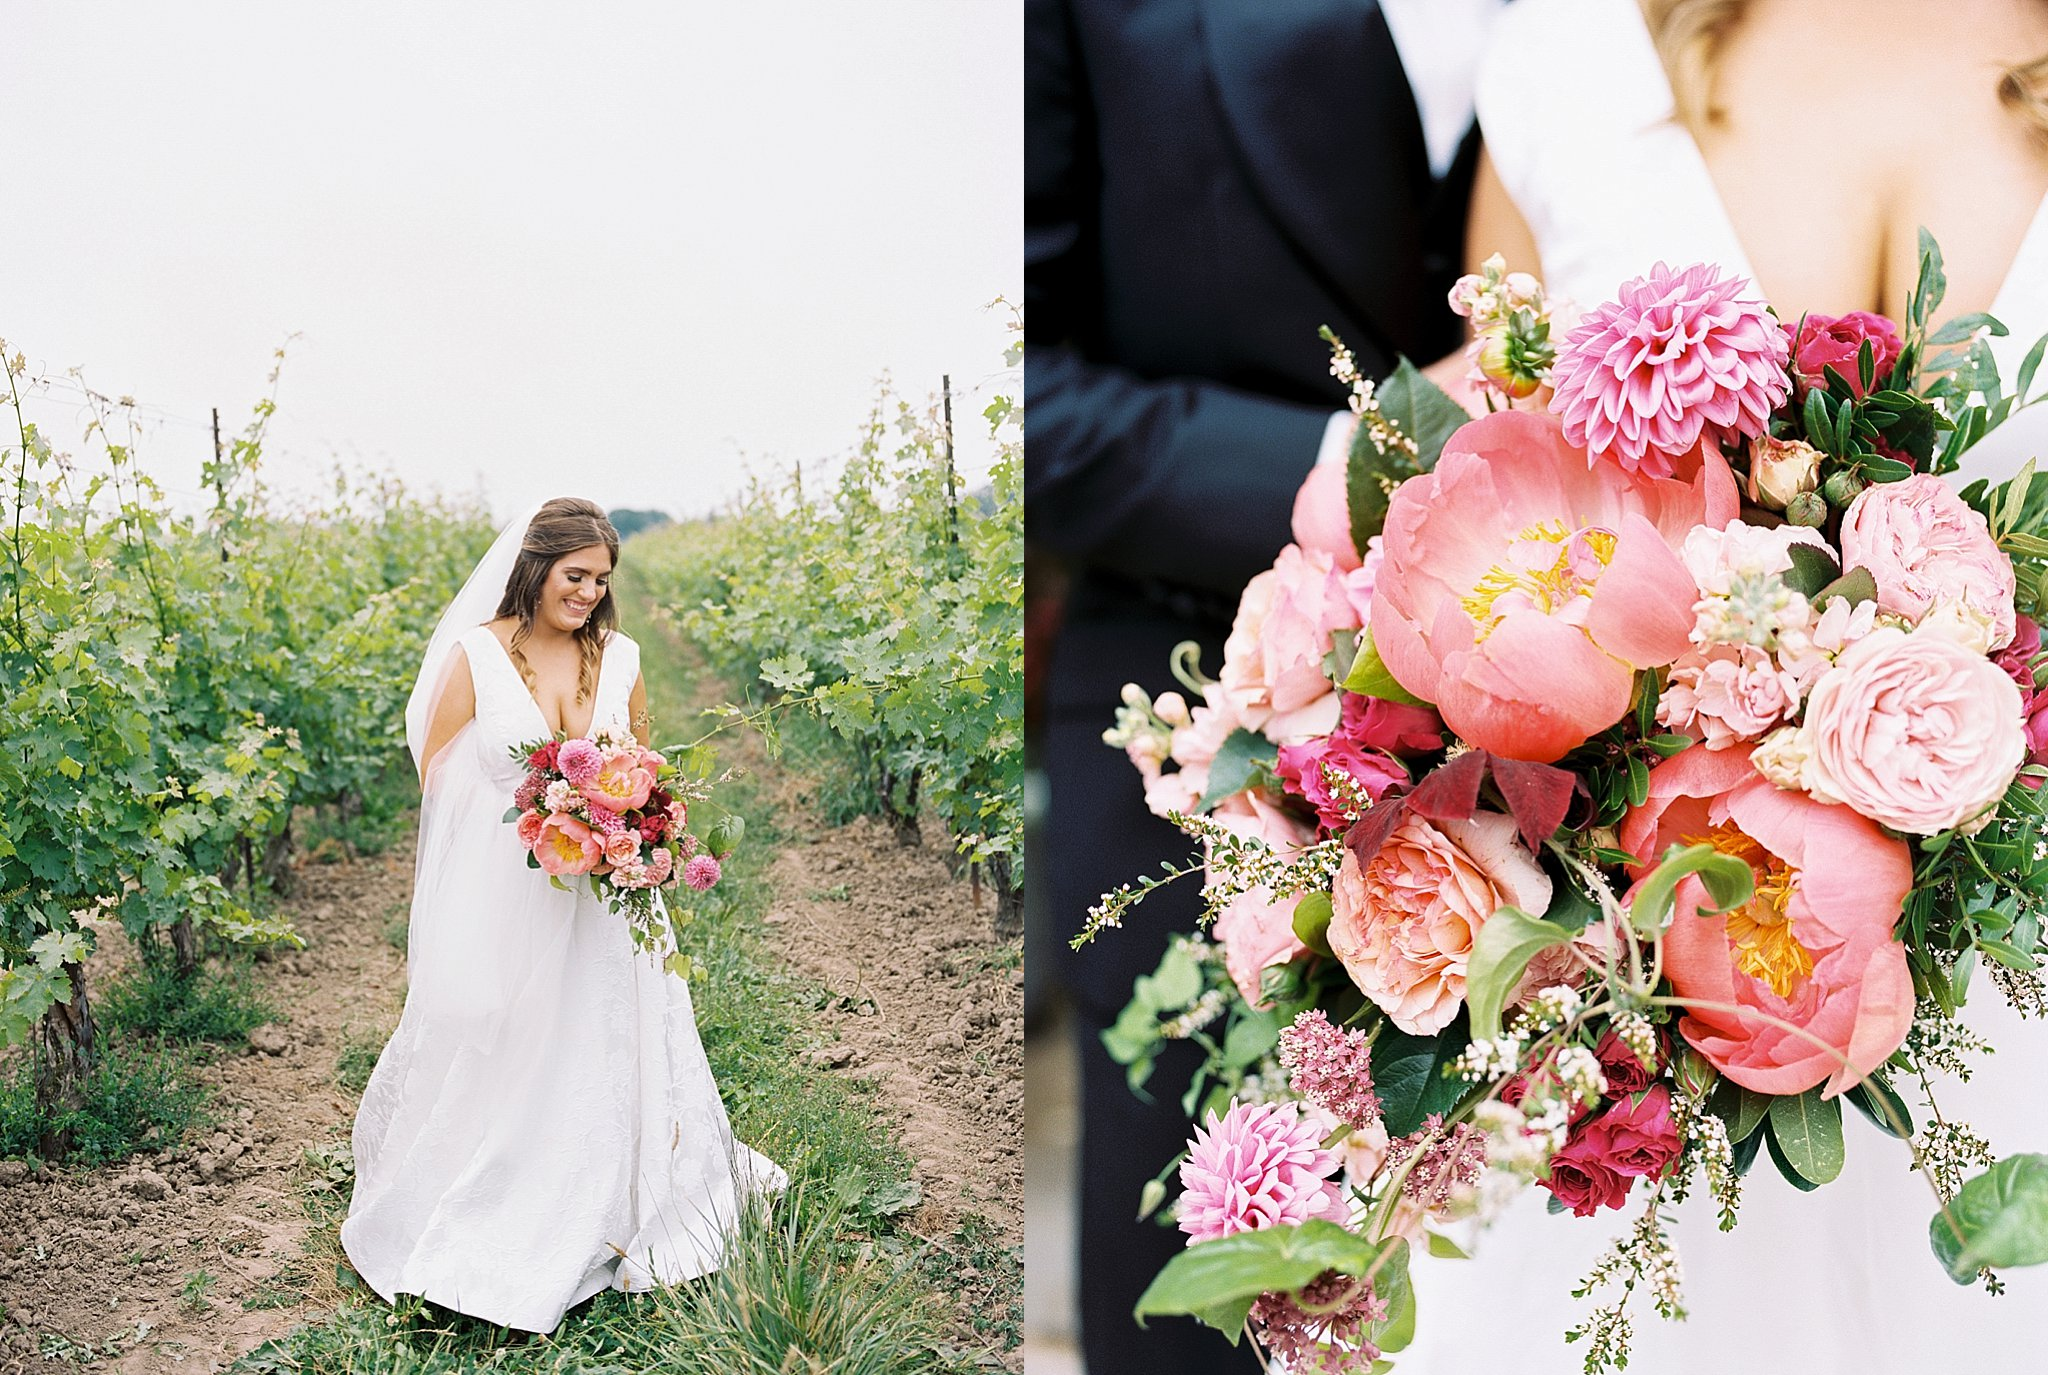 Film Photographer, Toronto FIlm Photographer, Durham Region Wedding Photographer